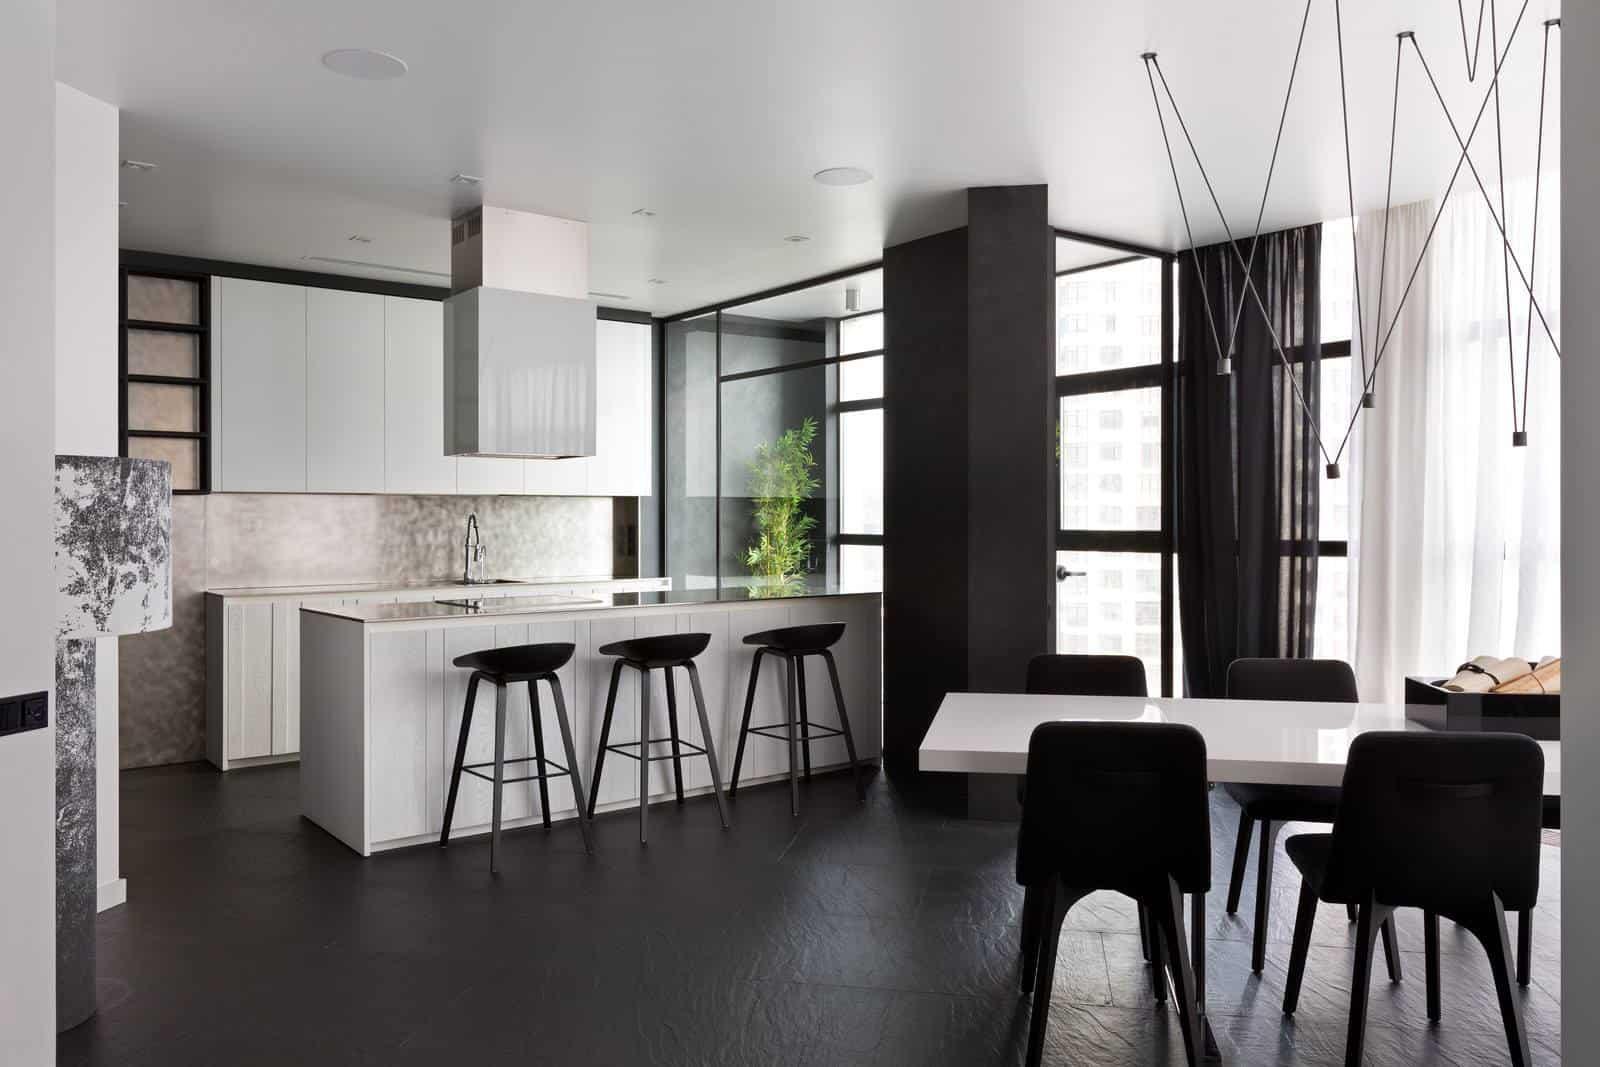 thiet-ke-noi-that-chung-cu-mai-dich-11 Thiết kế nội thất chung cư Mai Dịch - A. Sinh